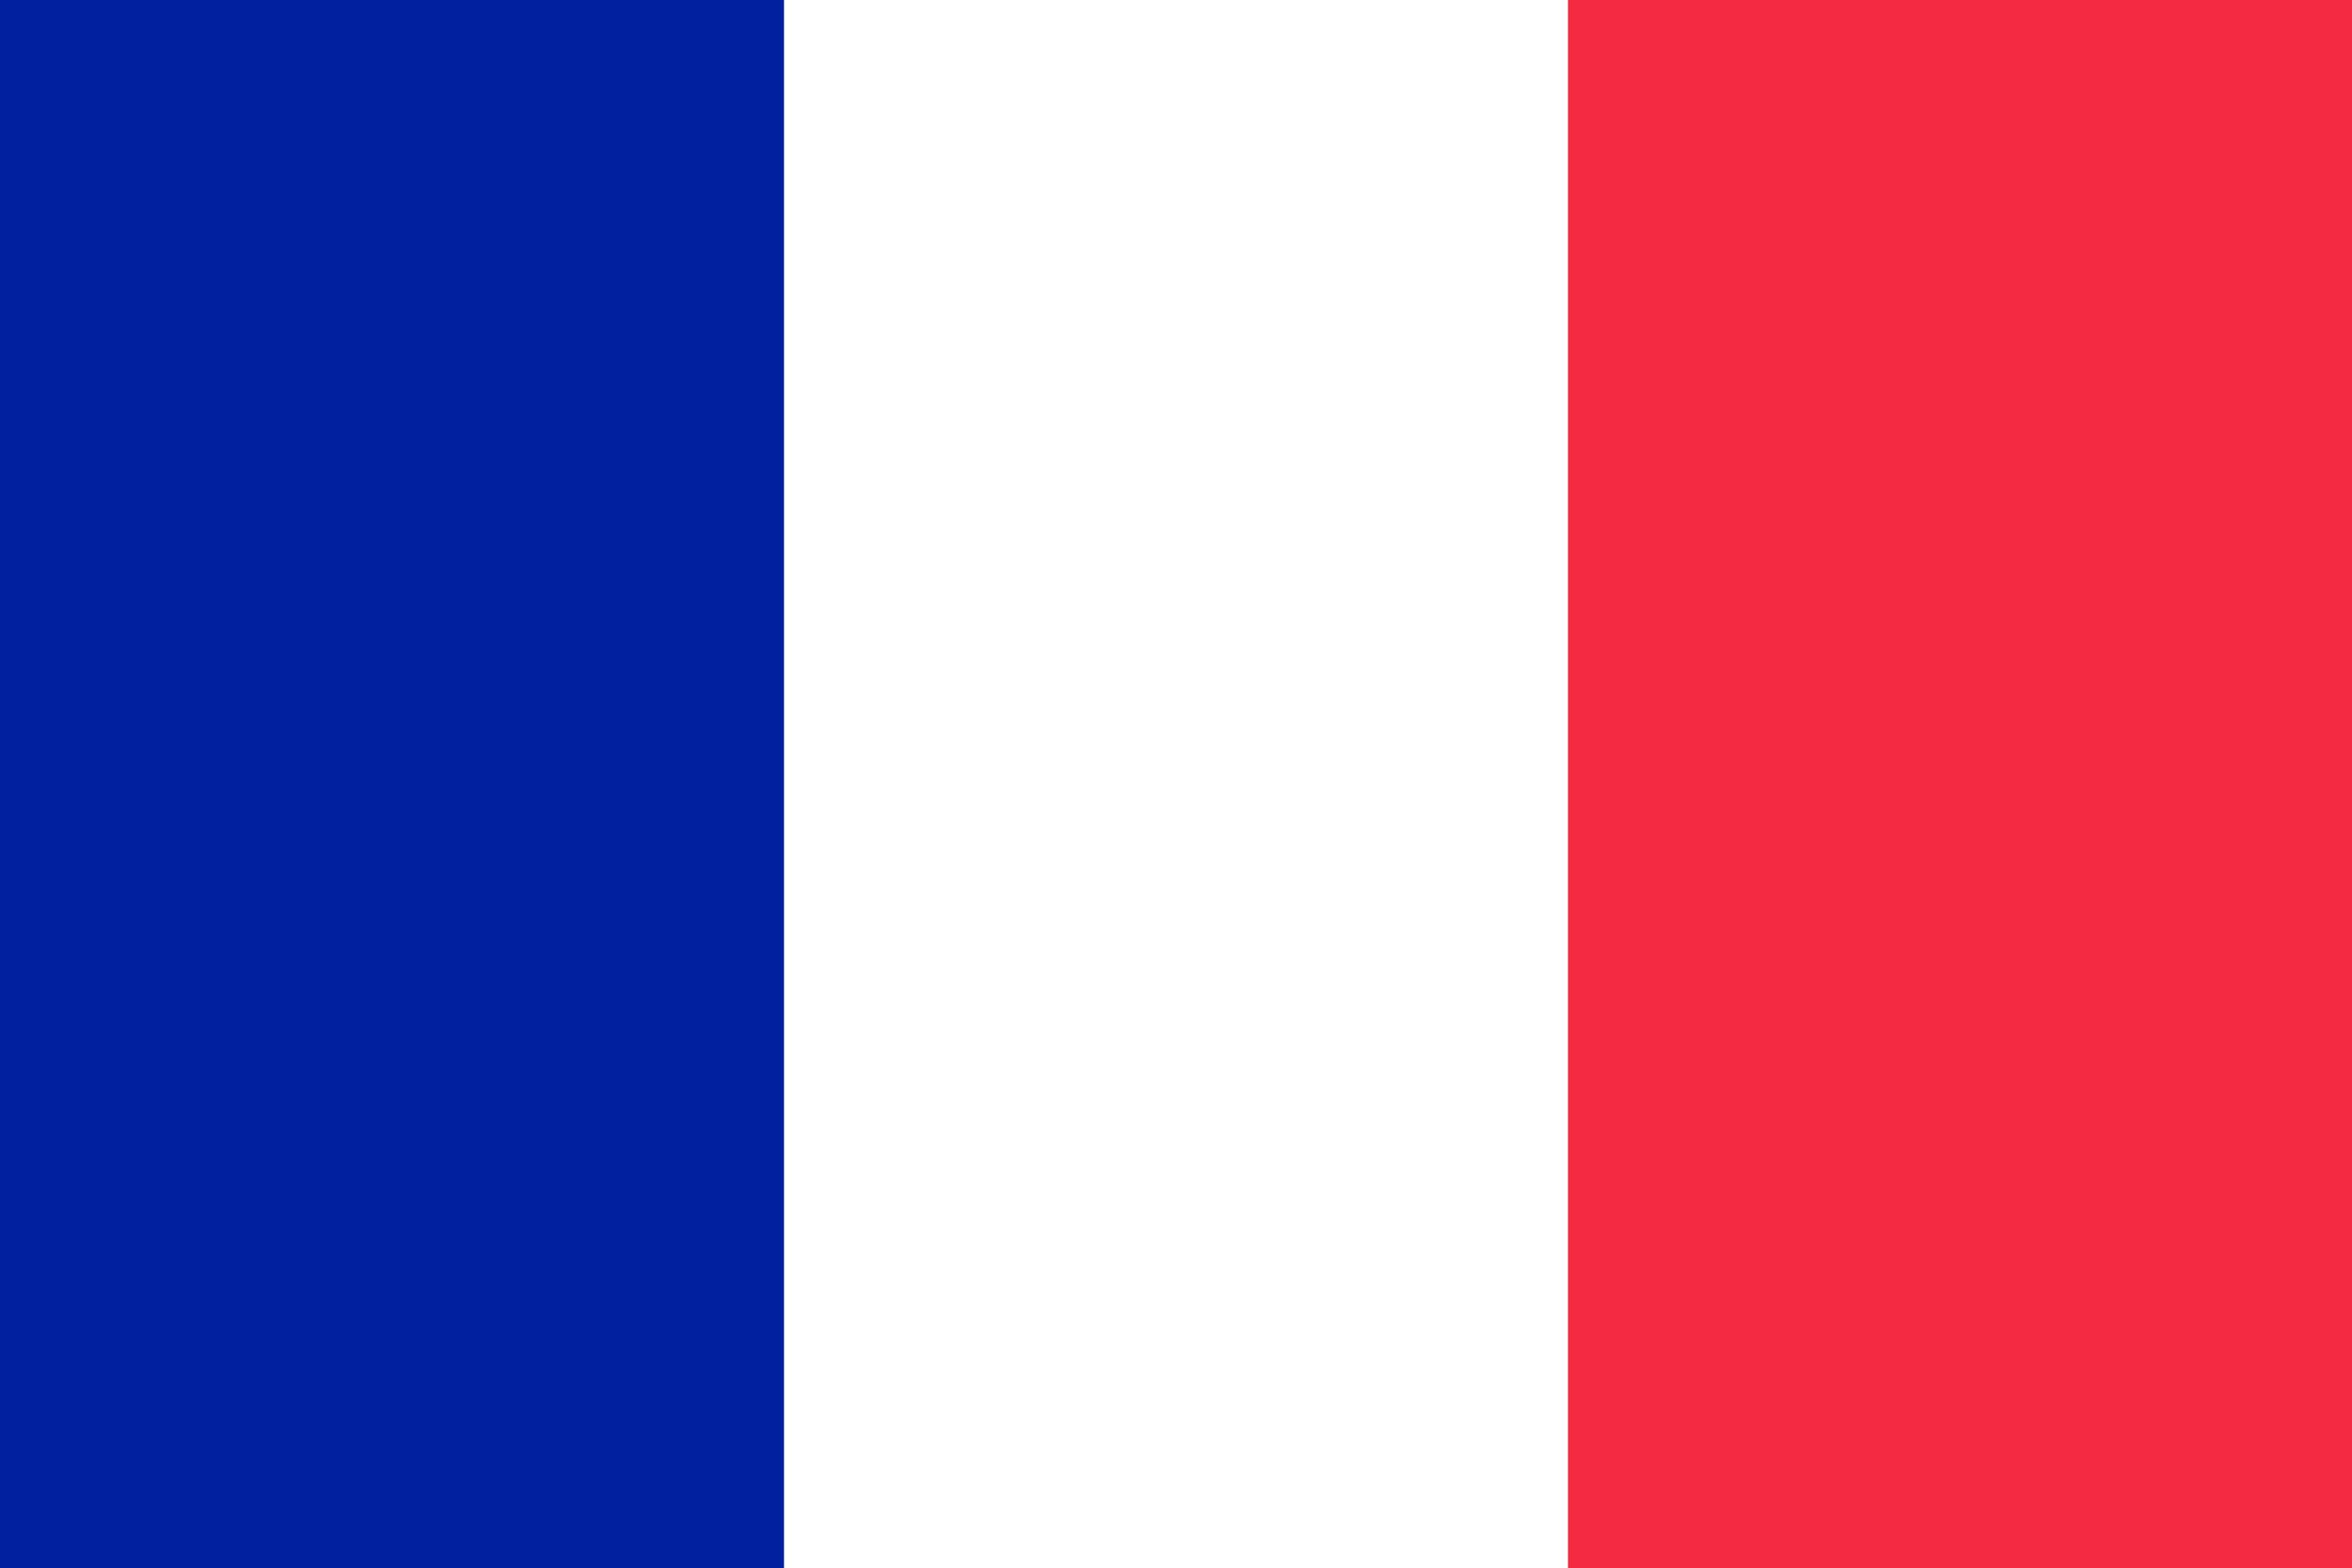 फ़्रांस, देश, emblema, लोग�प्रतीकbolo - HD वॉलपेपर - प्रोफेसर-falken.com